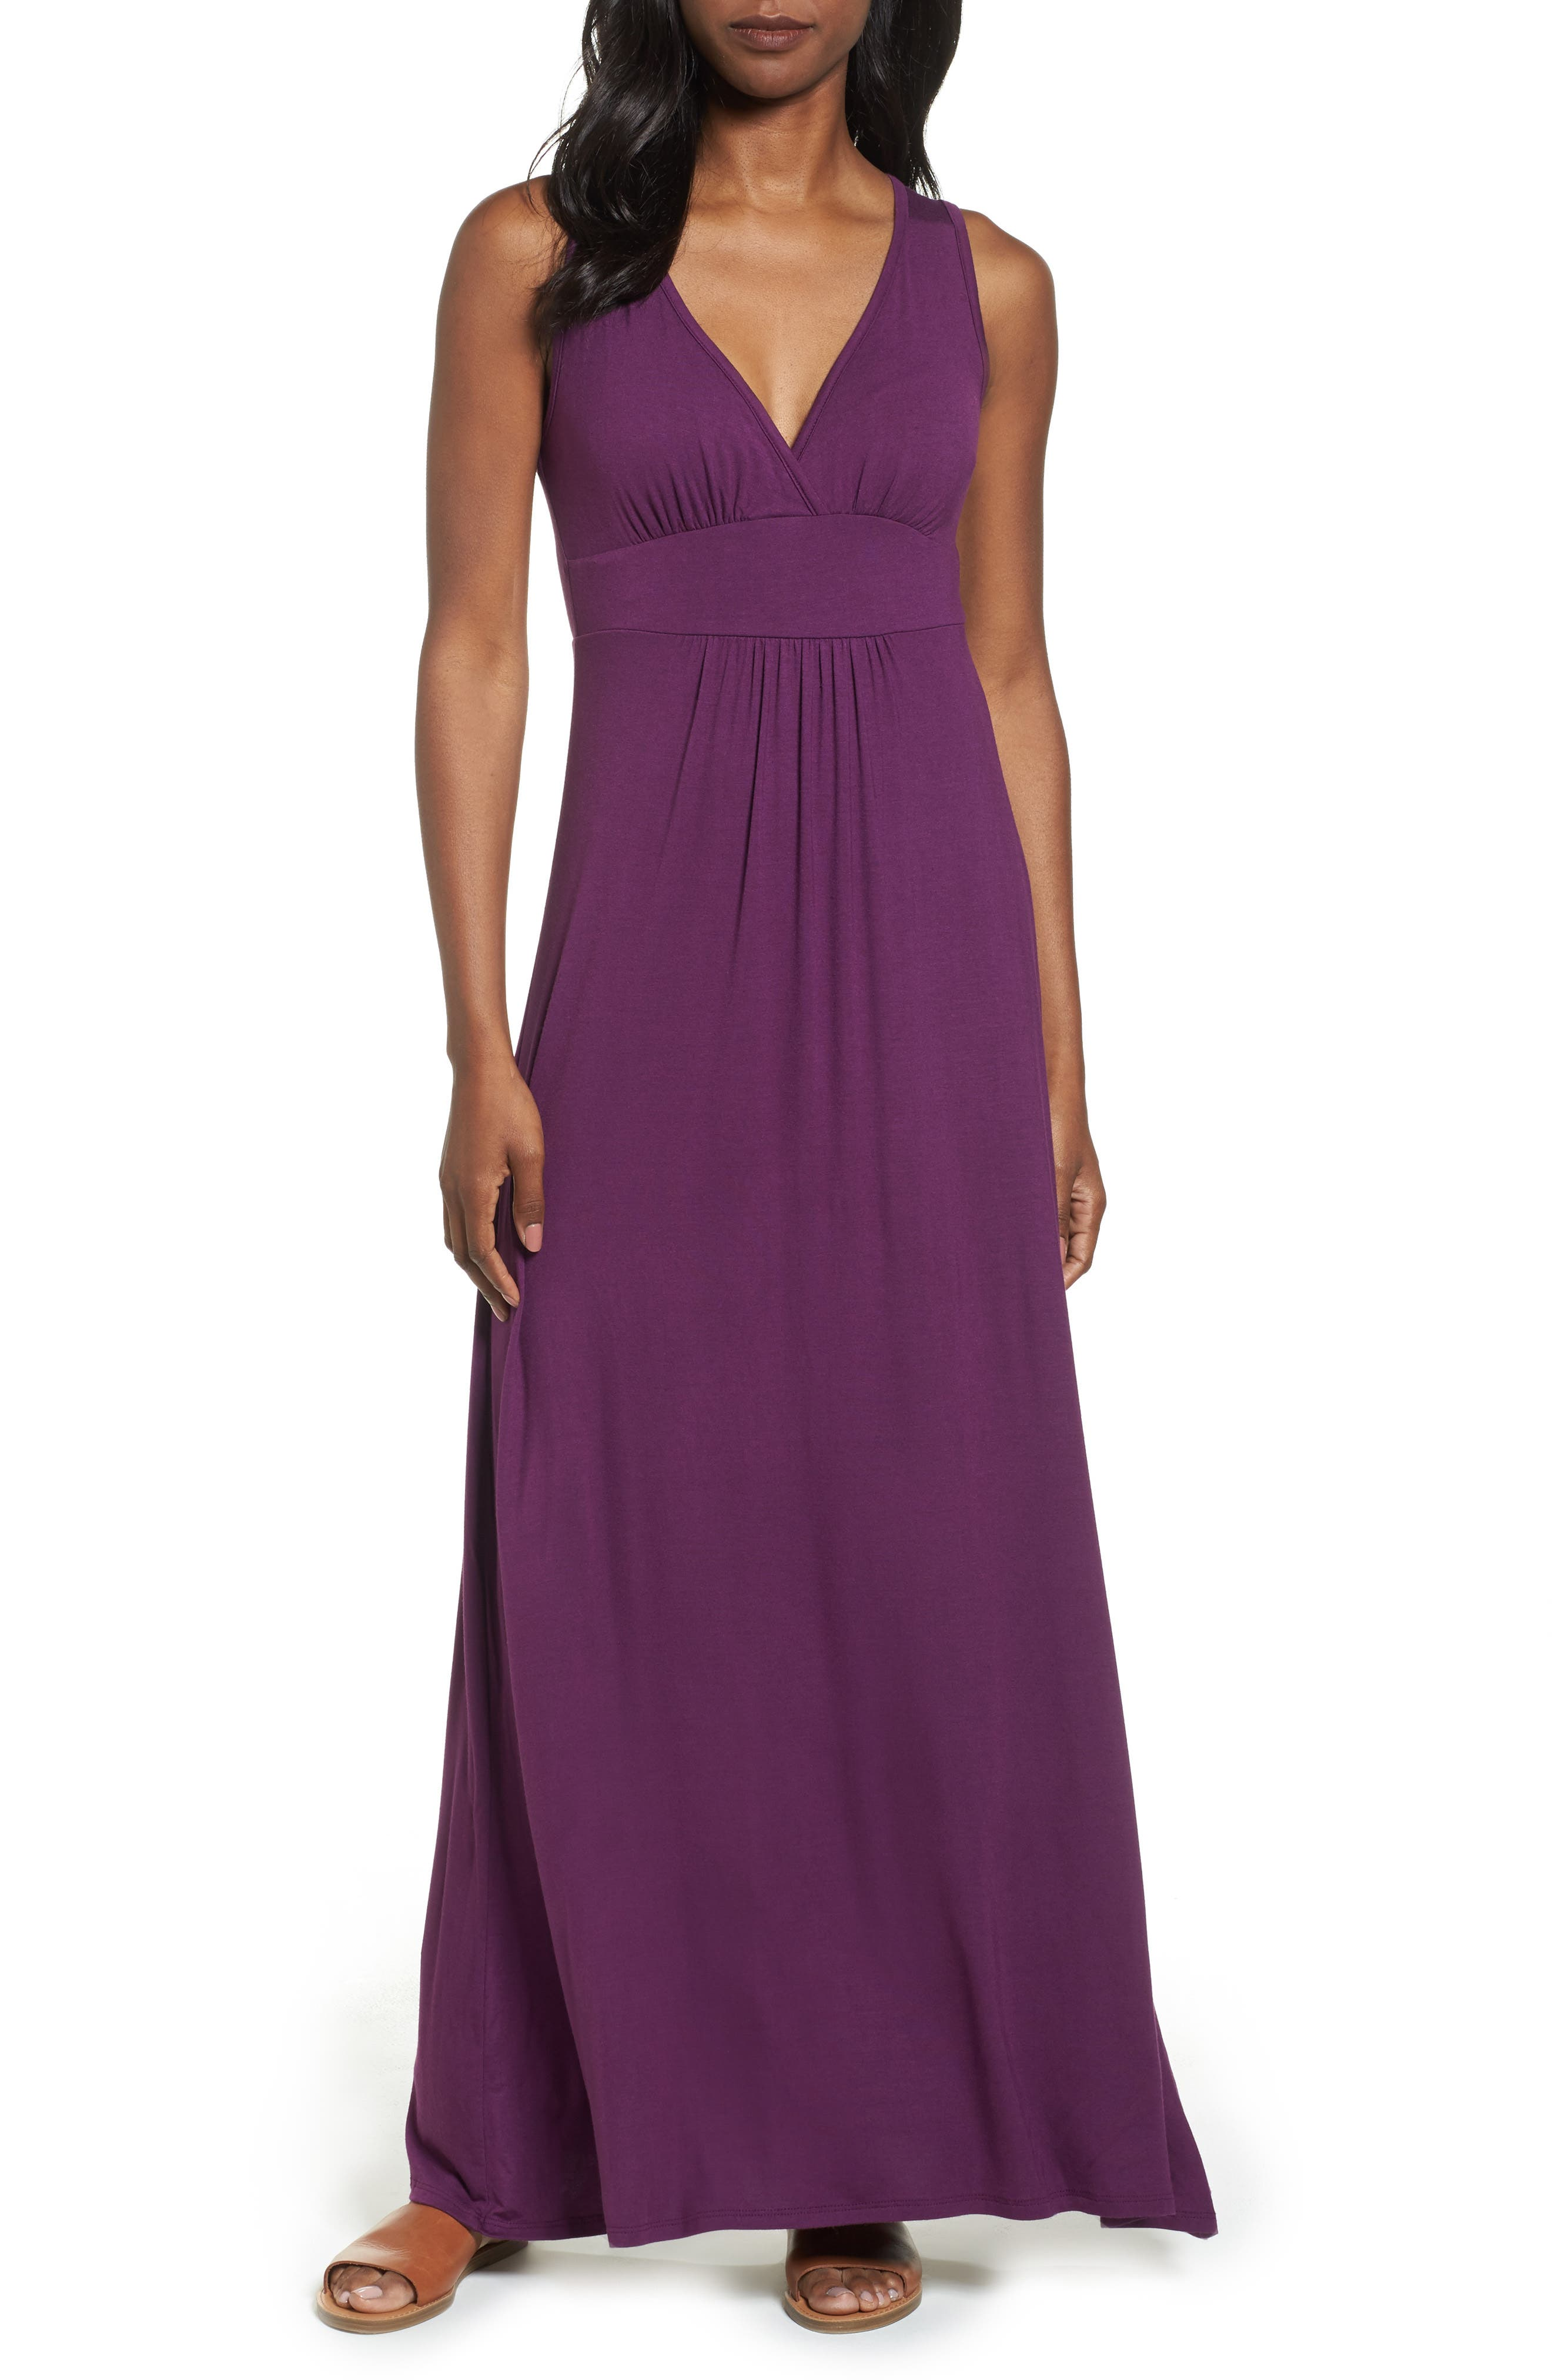 LOVEAPPELLA, V-Neck Jersey Maxi Dress, Main thumbnail 1, color, PURPLE DARK